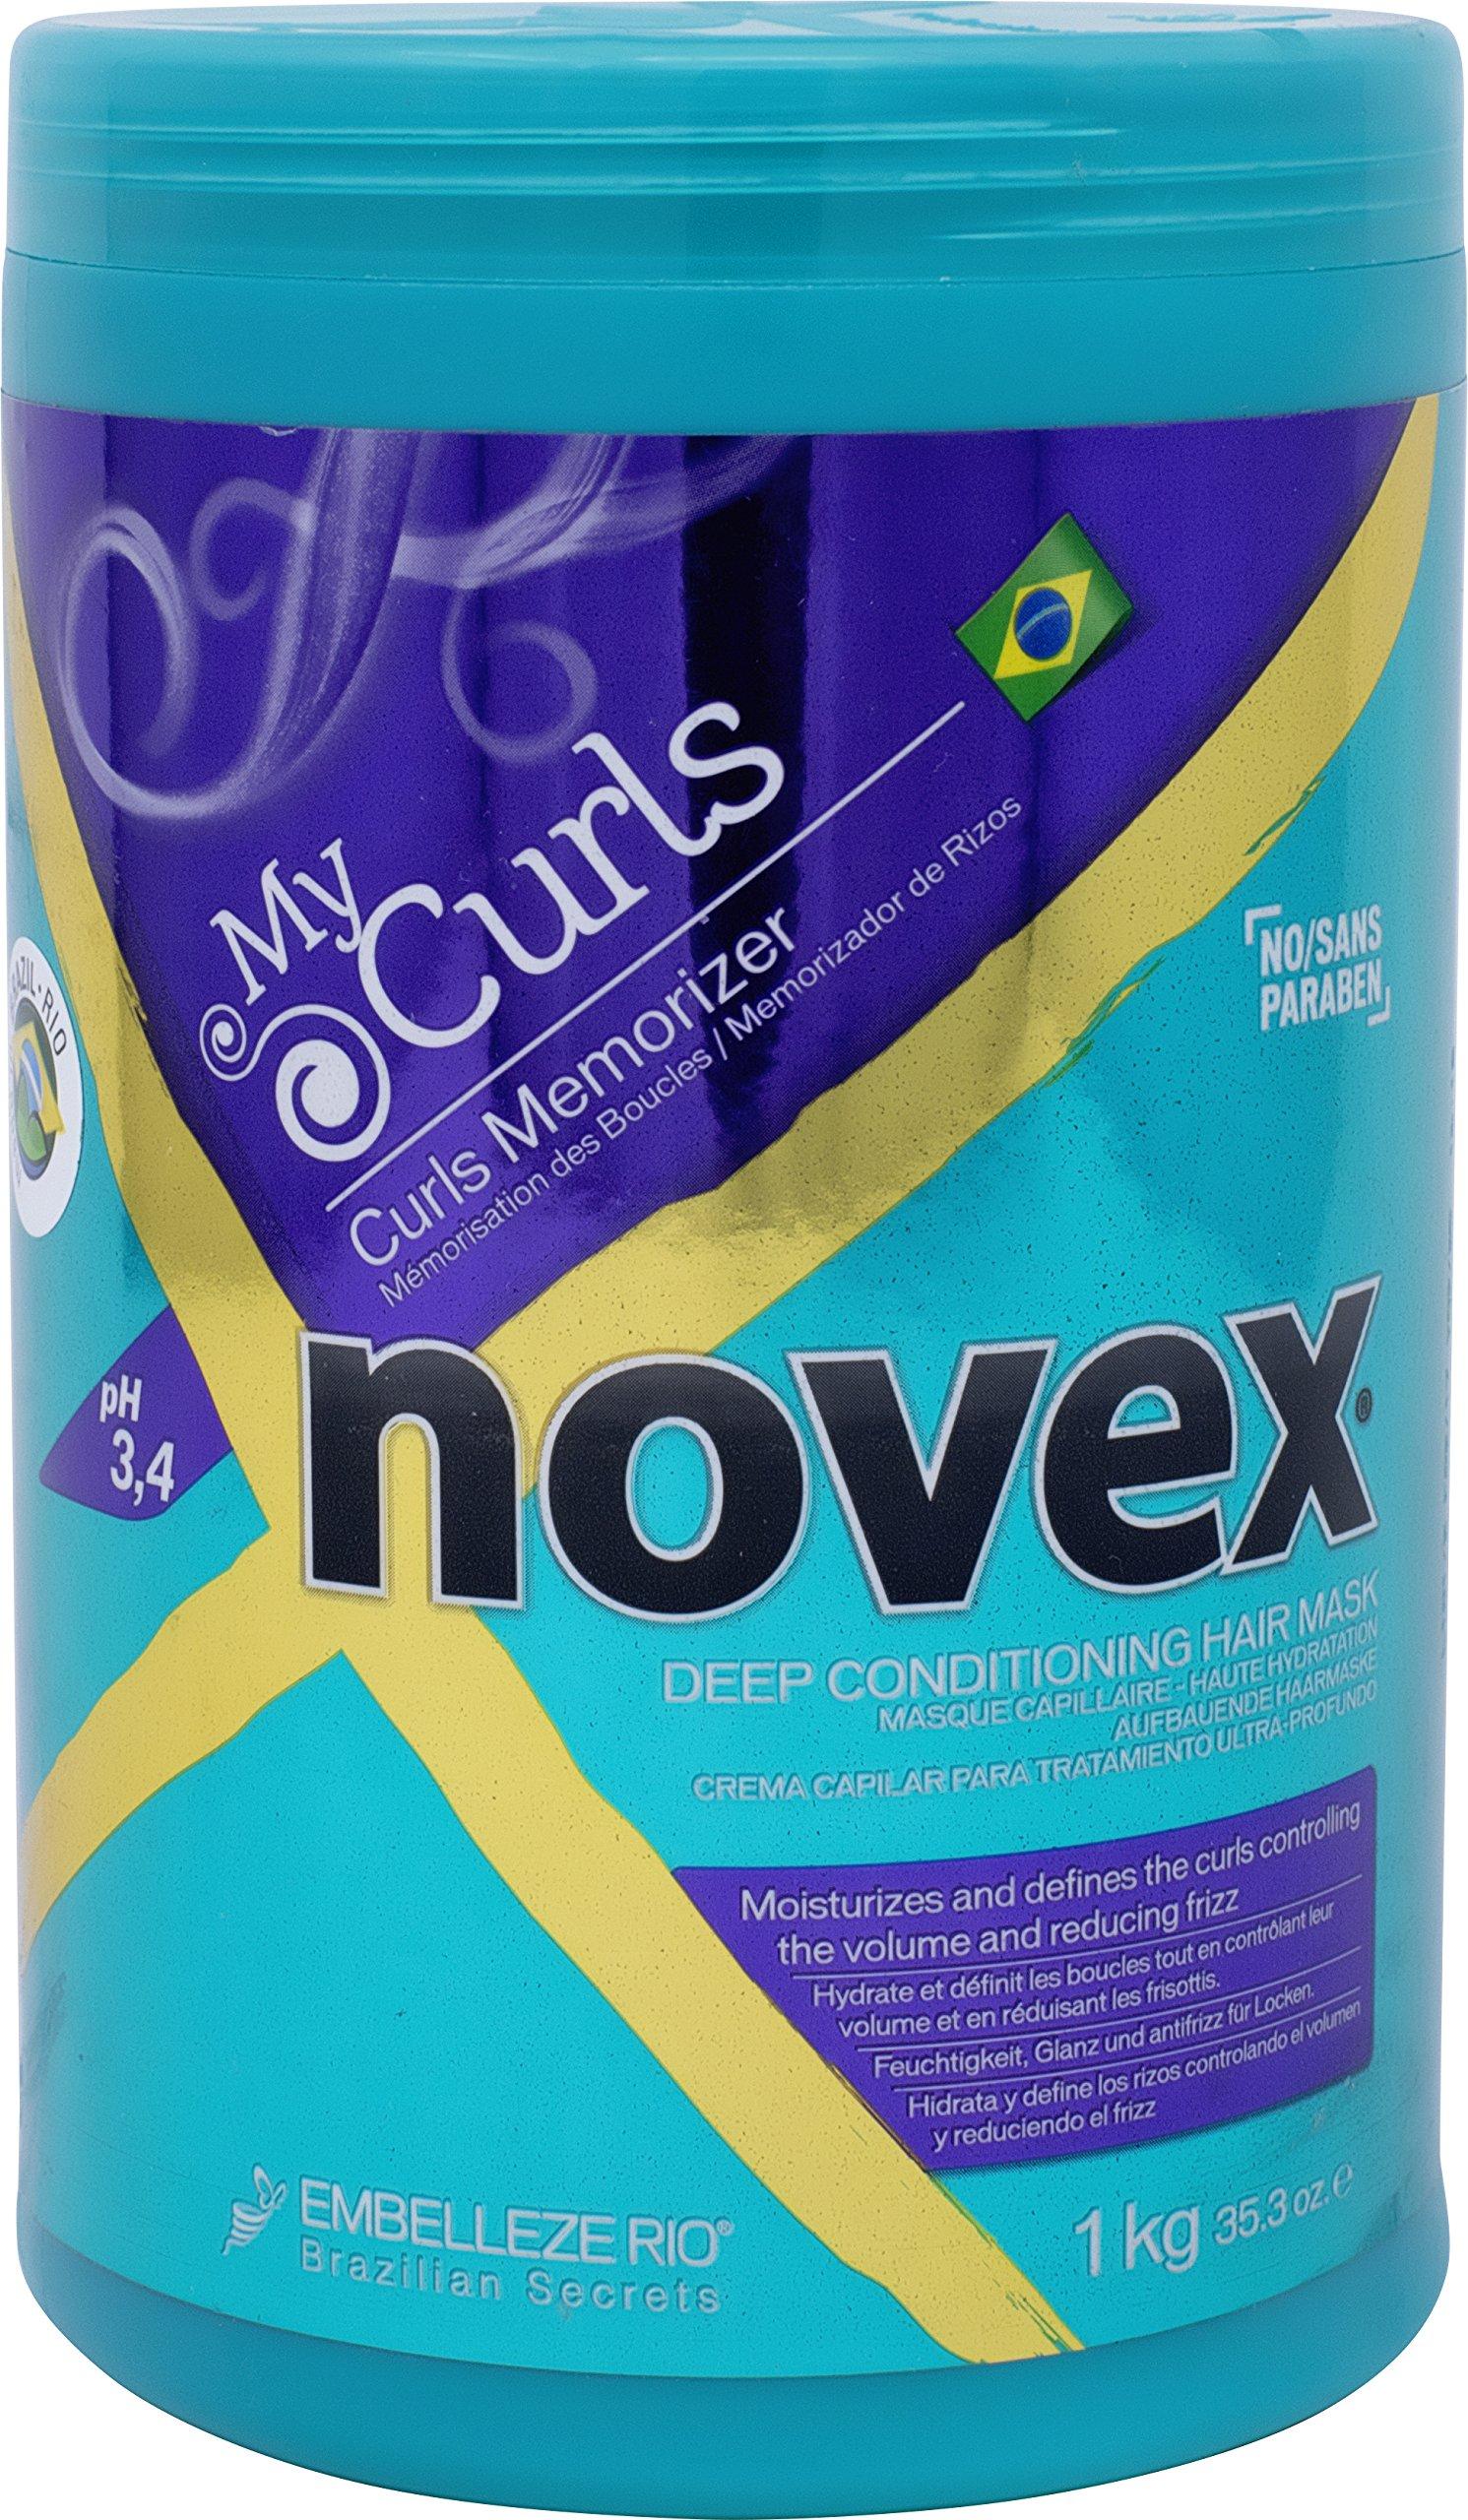 Embelleze Novex My Curls Deep Conditioning Hair Mask Cream (35.2oz) Moisturizing Treatment Defines